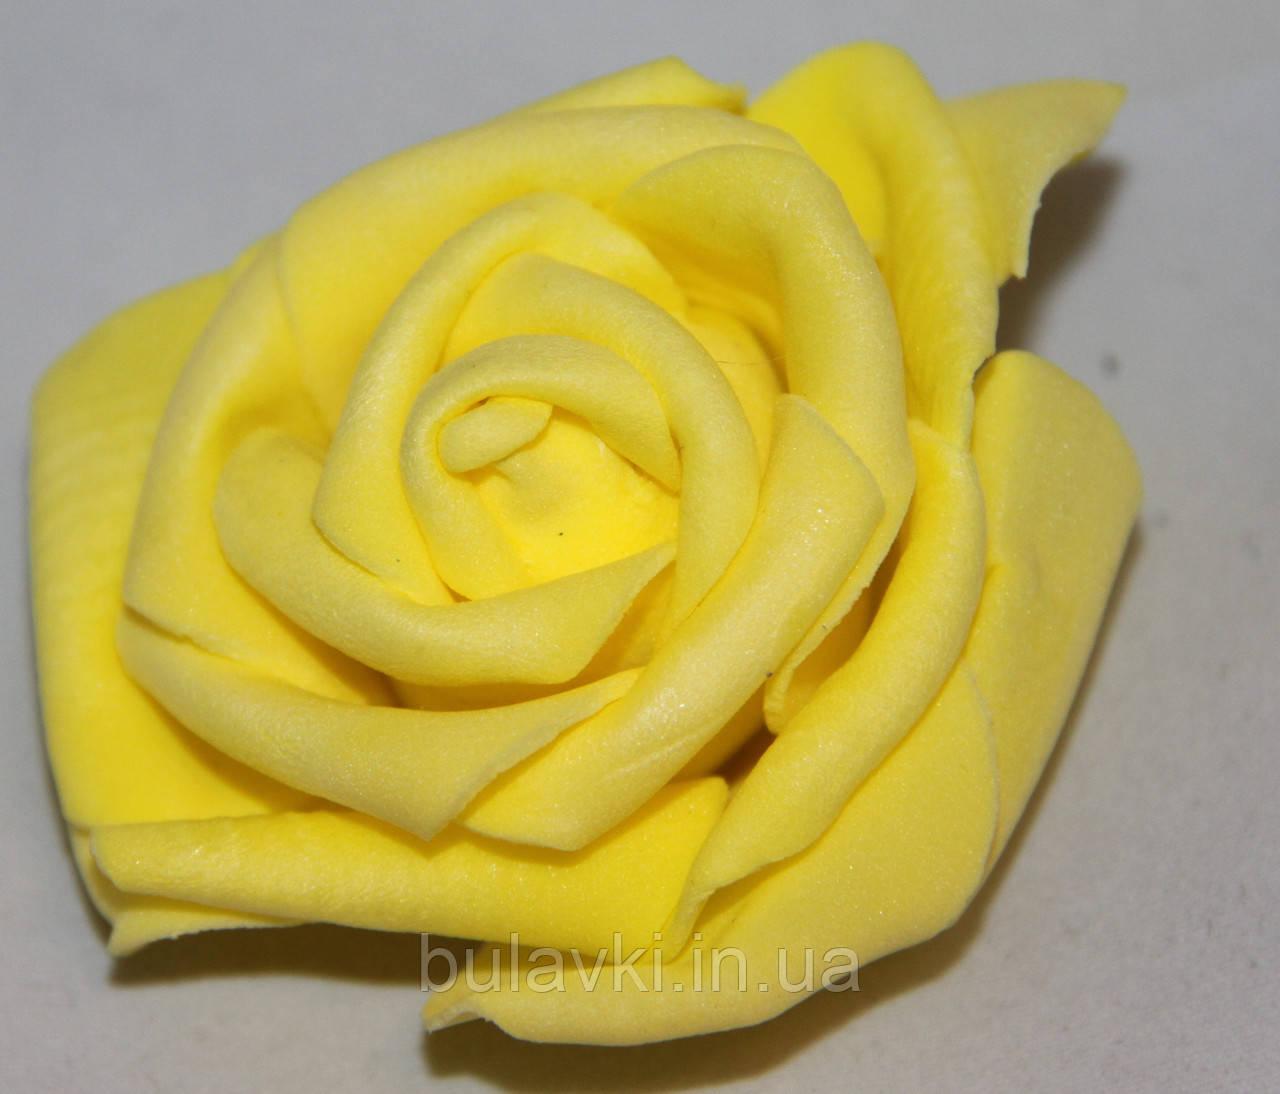 Роза(большая)желтая   2016-1-16-1